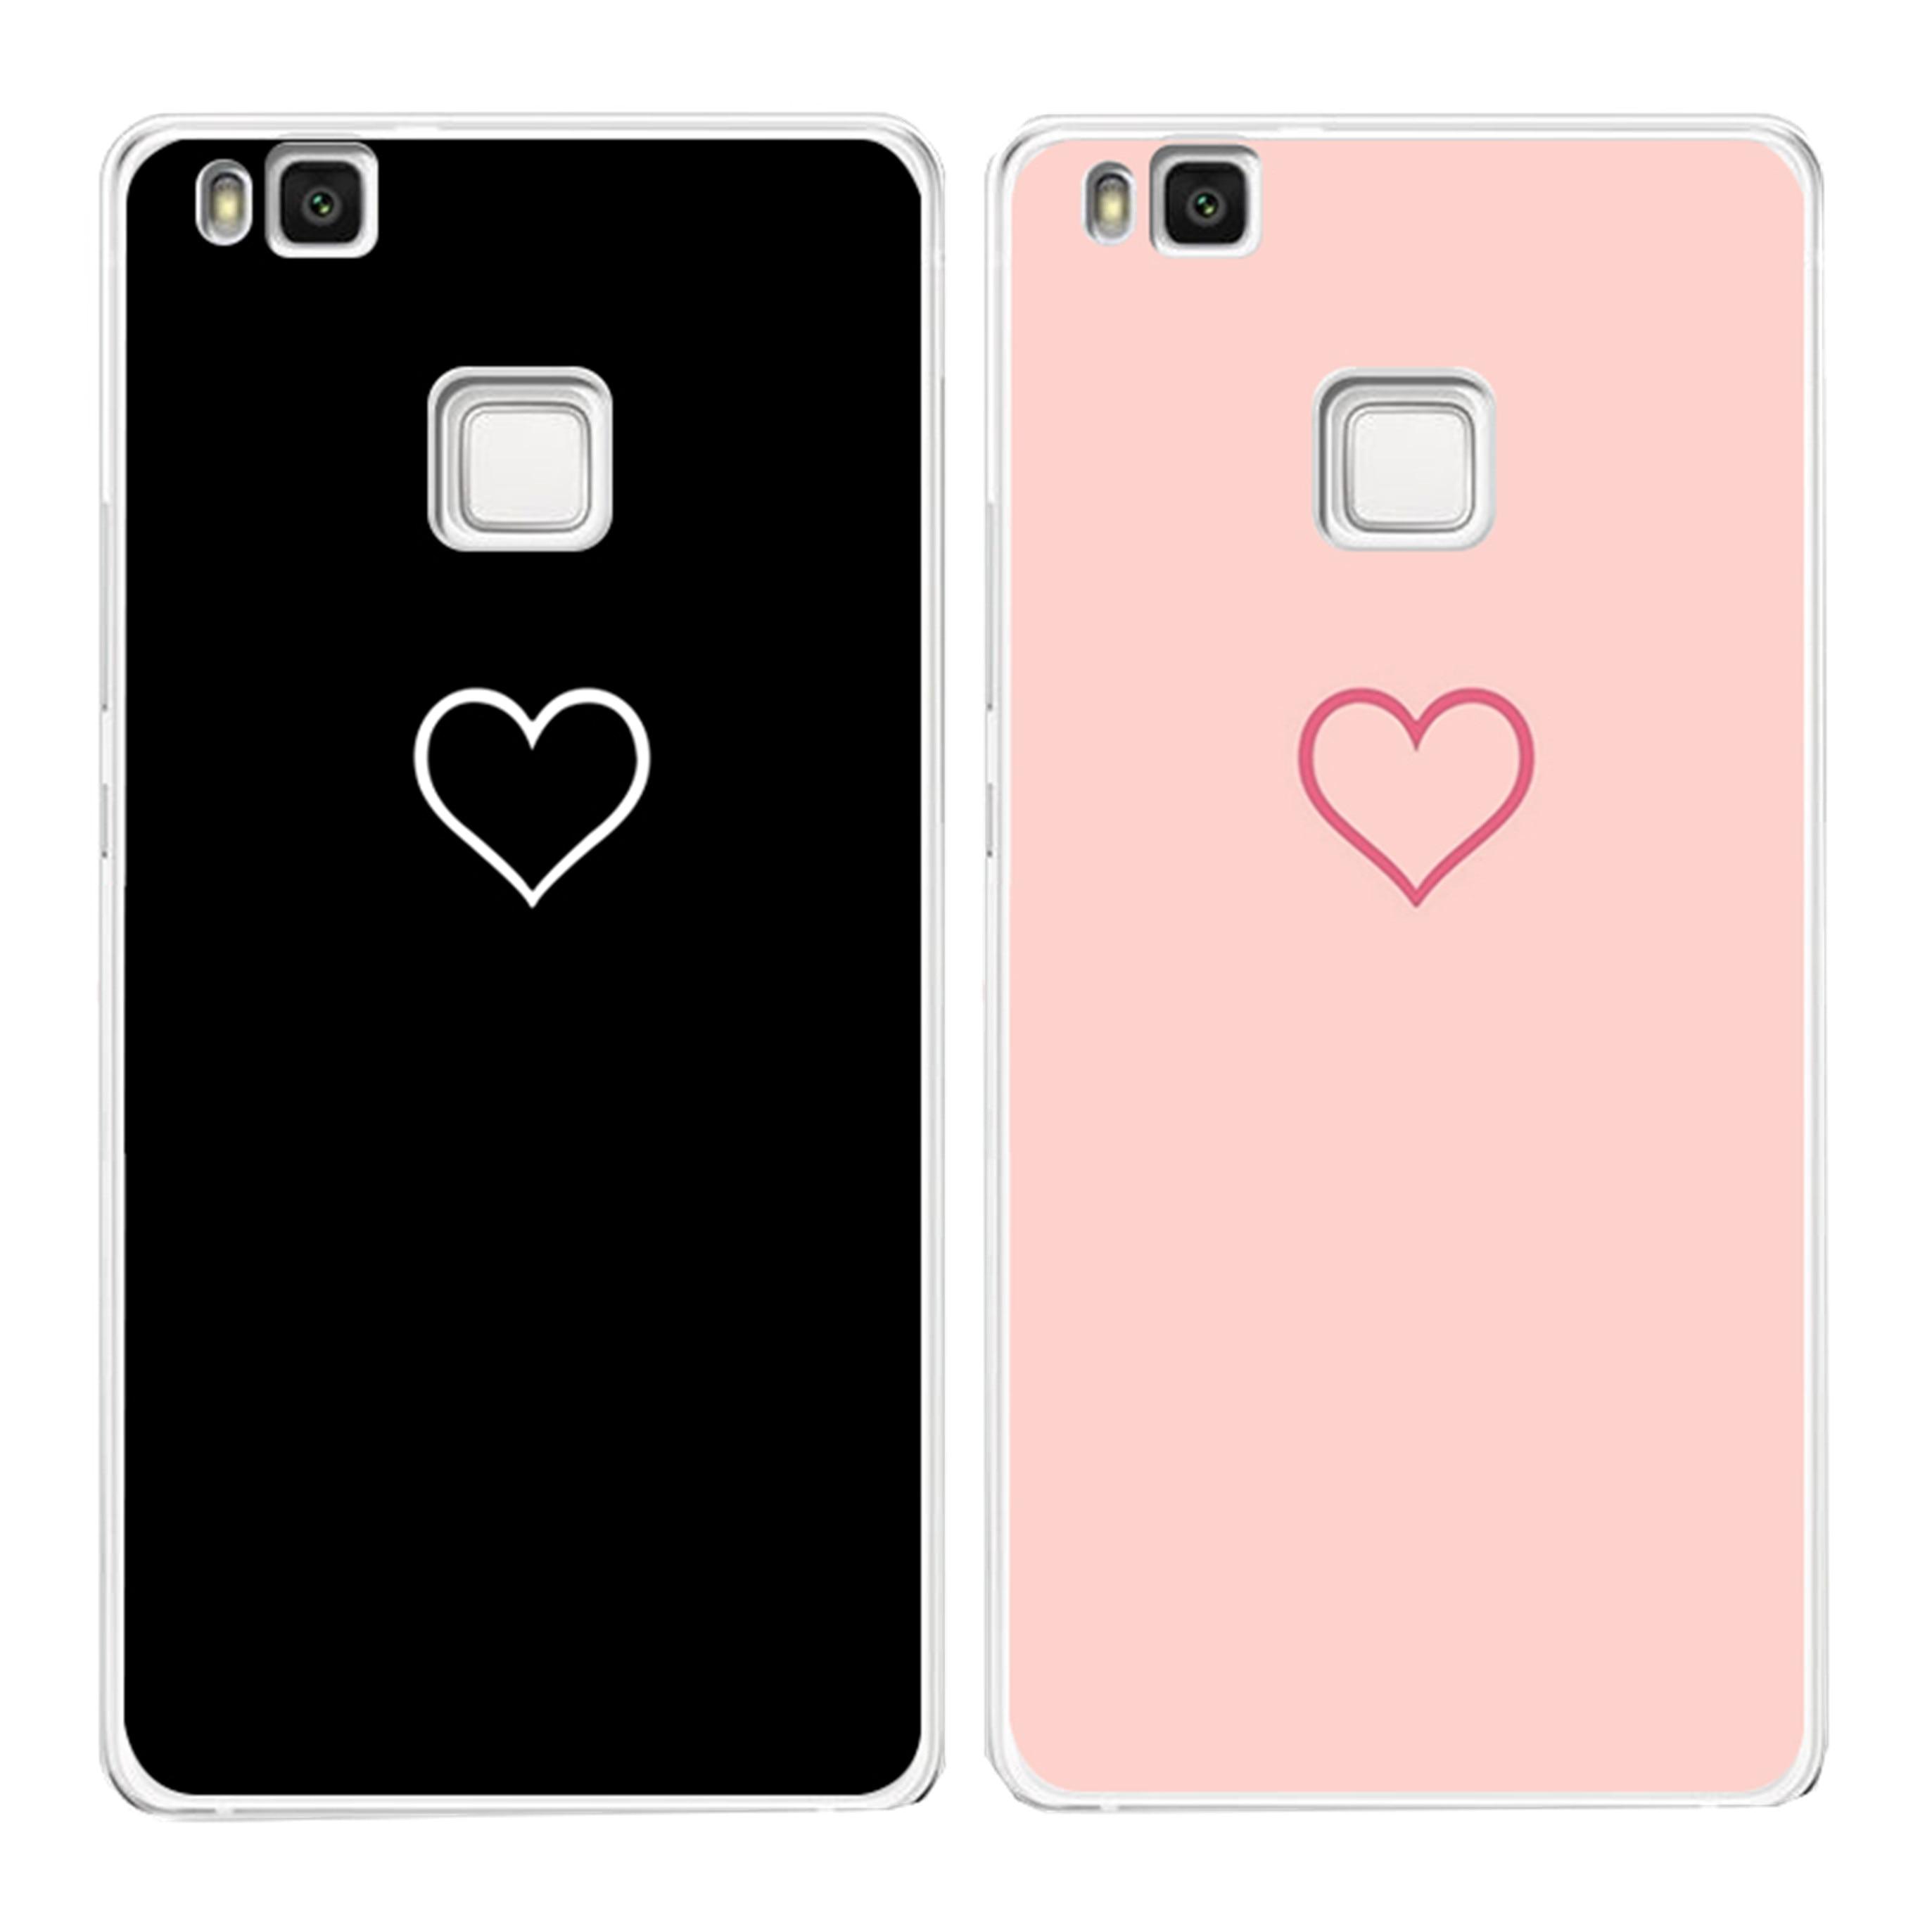 for huawei p8 p9 mini mate 10 p10 lite 2017 case hollow heart coque back ultra thin originality